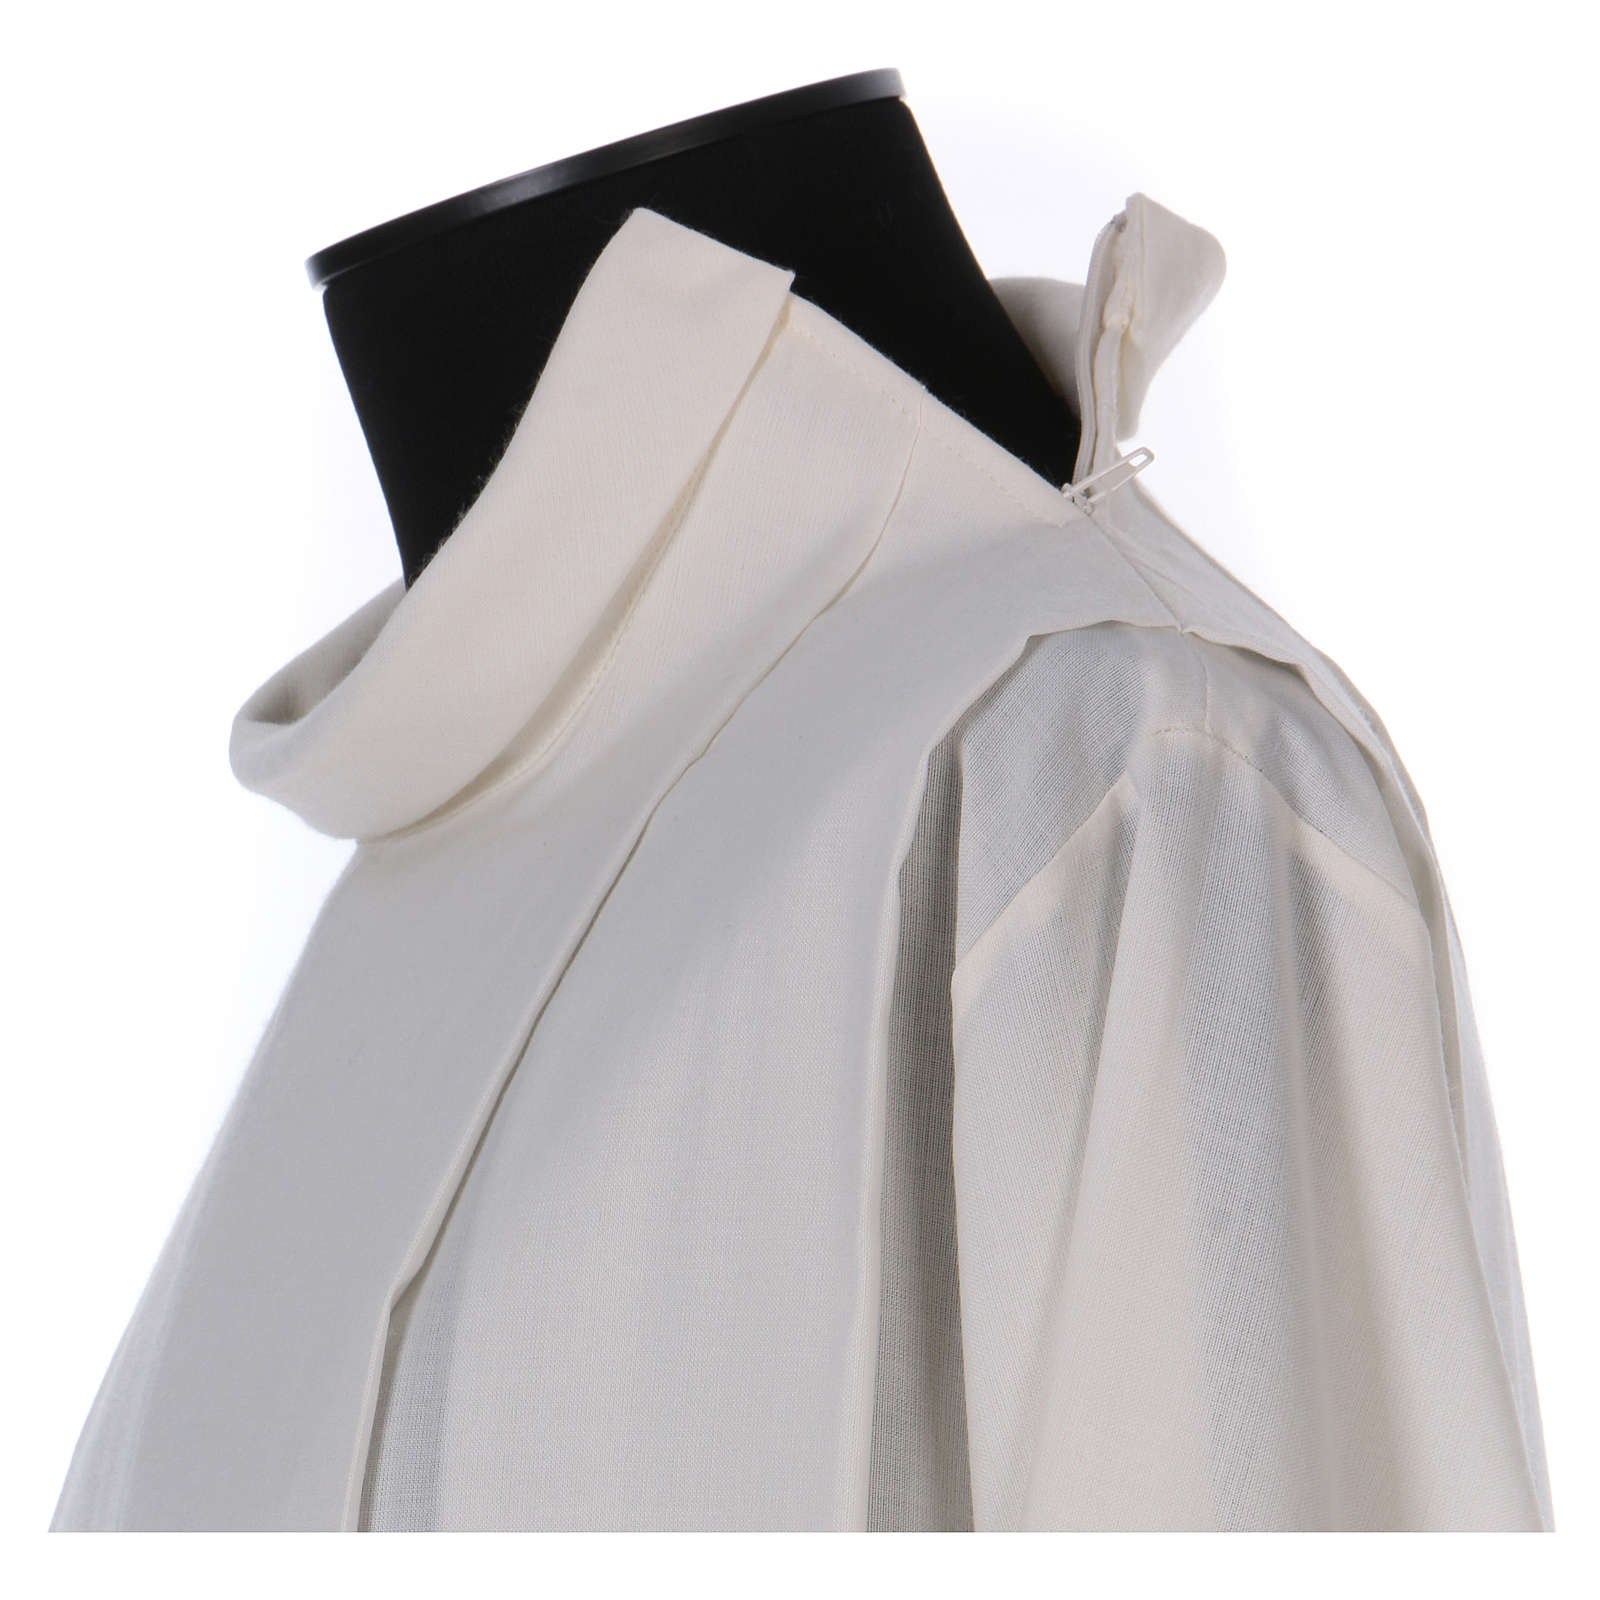 Alba marfil 55% lana 45% poliéster cremallera hombro 4